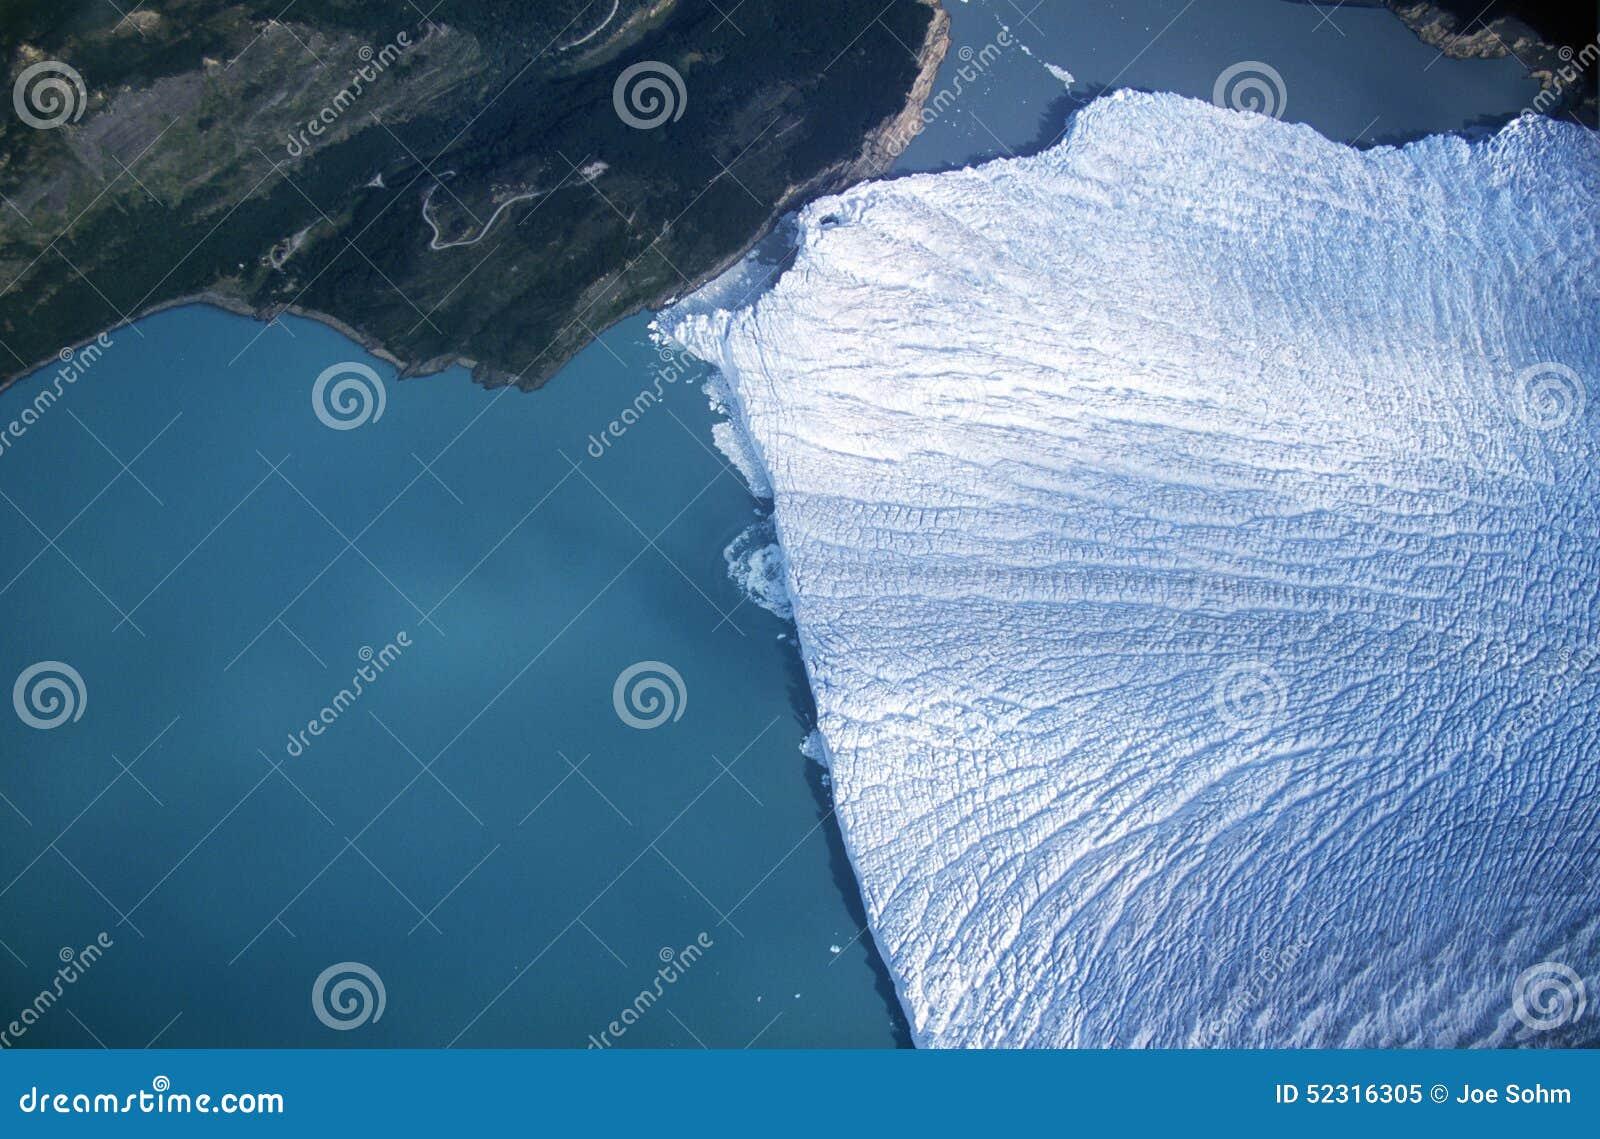 Flyg- sikt av Perito Moreno Glacier nära El Calafate, Patagonia, Argentina